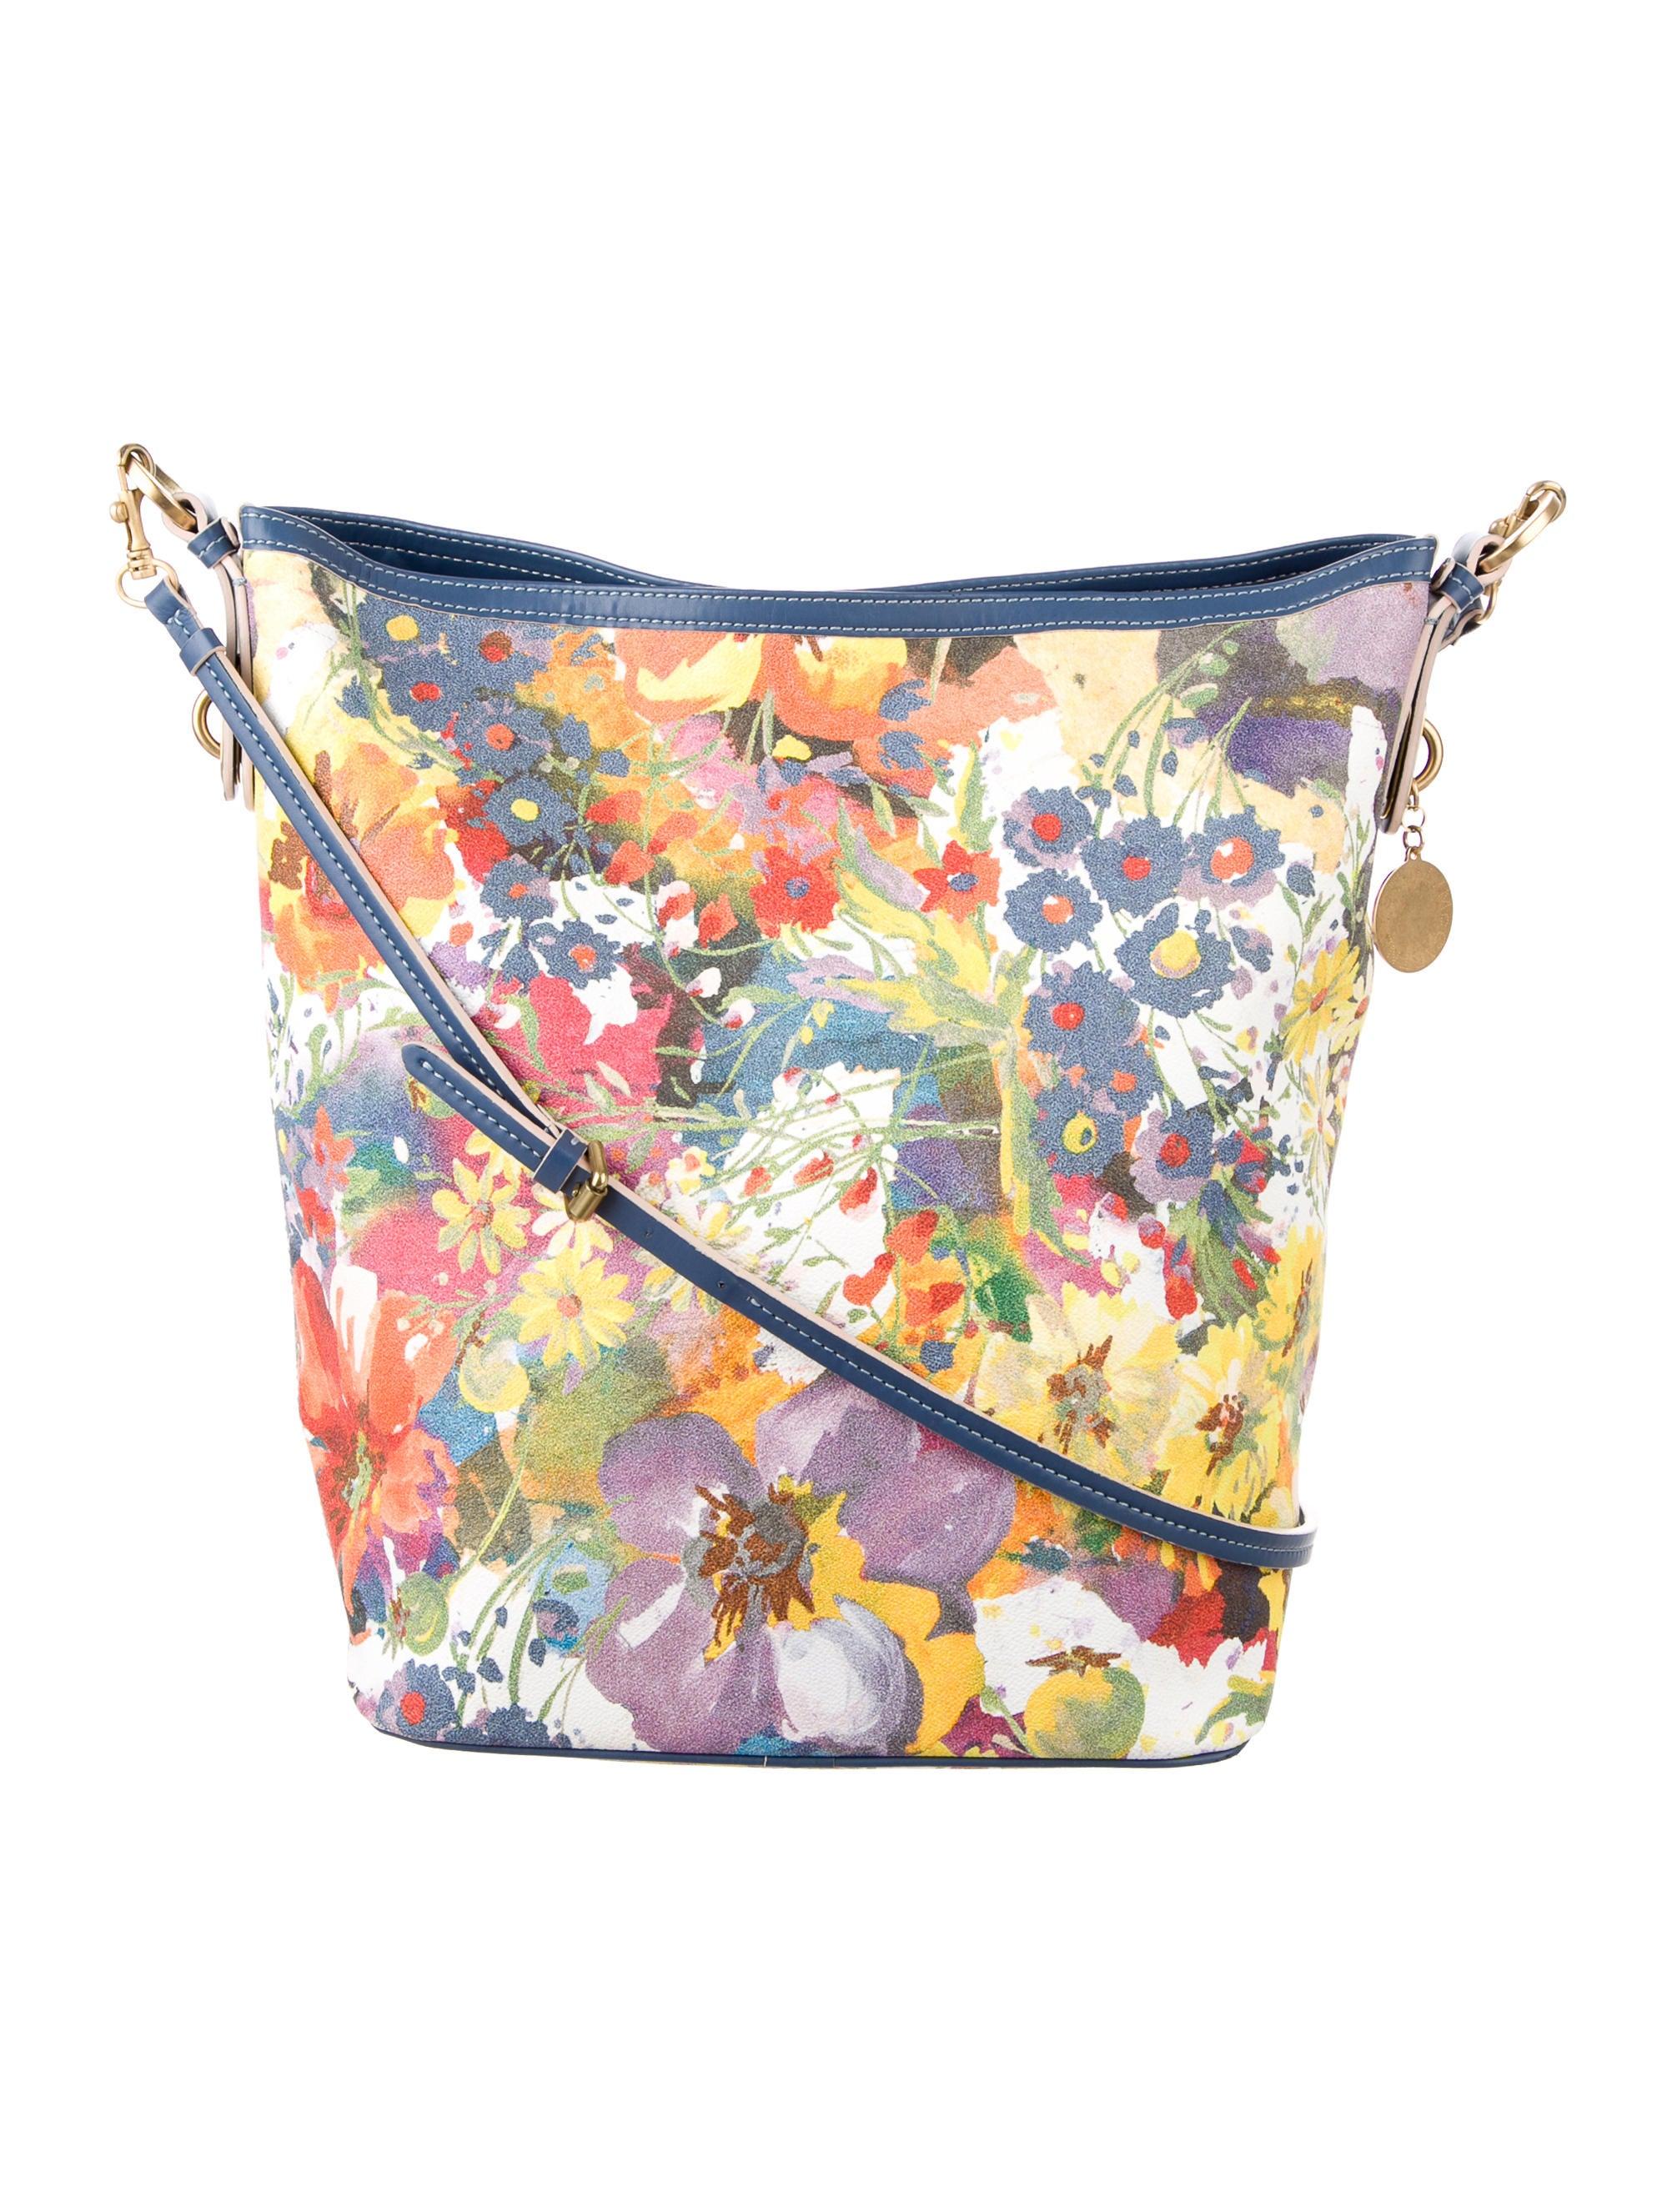 Stella McCartney Floral Print Vegan Leather Crossbody Bag - Handbags - STL48005 | The RealReal